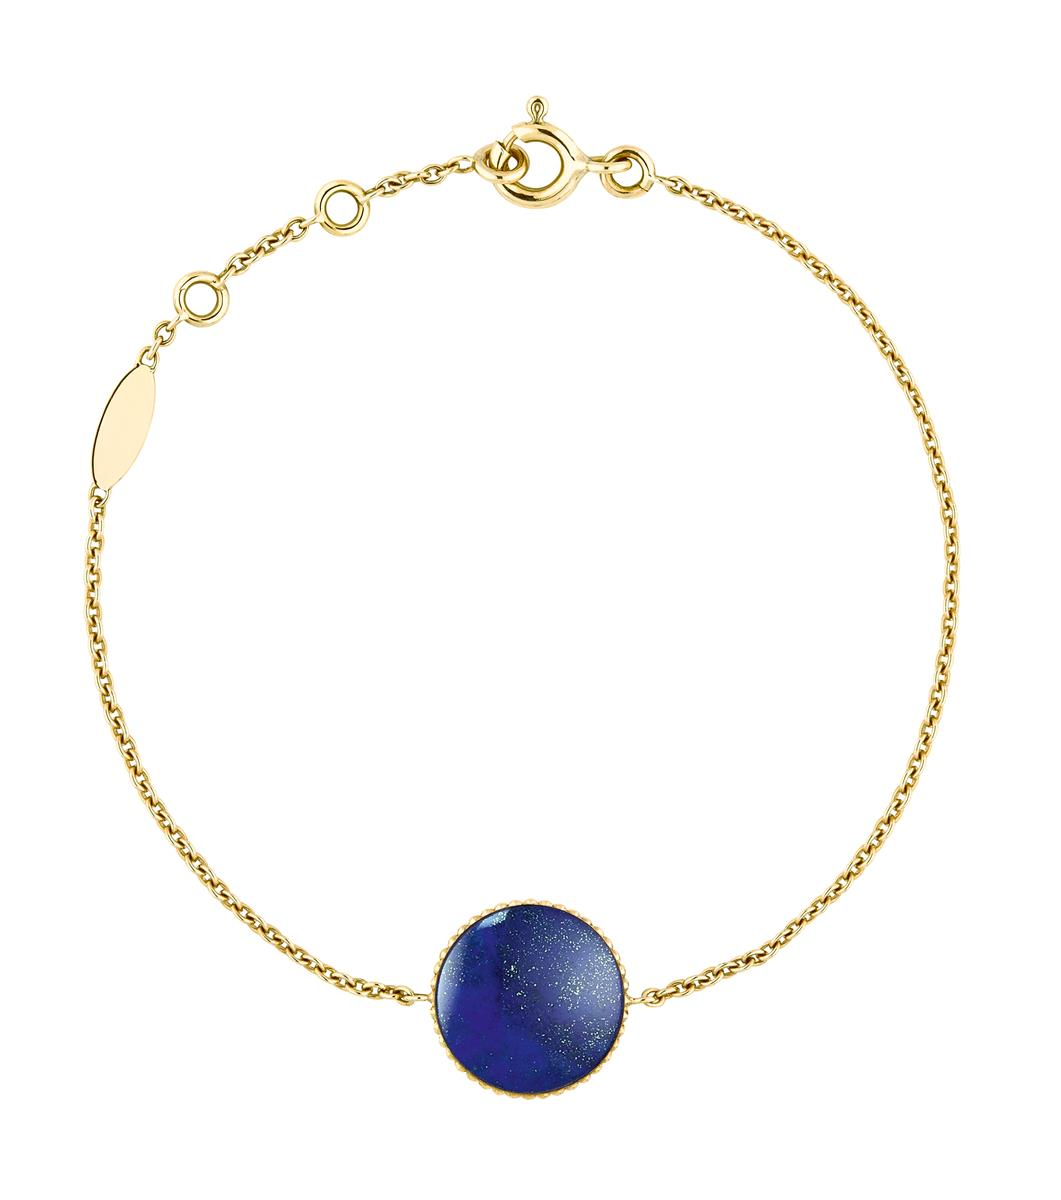 jewellery_JRDV95004_2 (Copy)